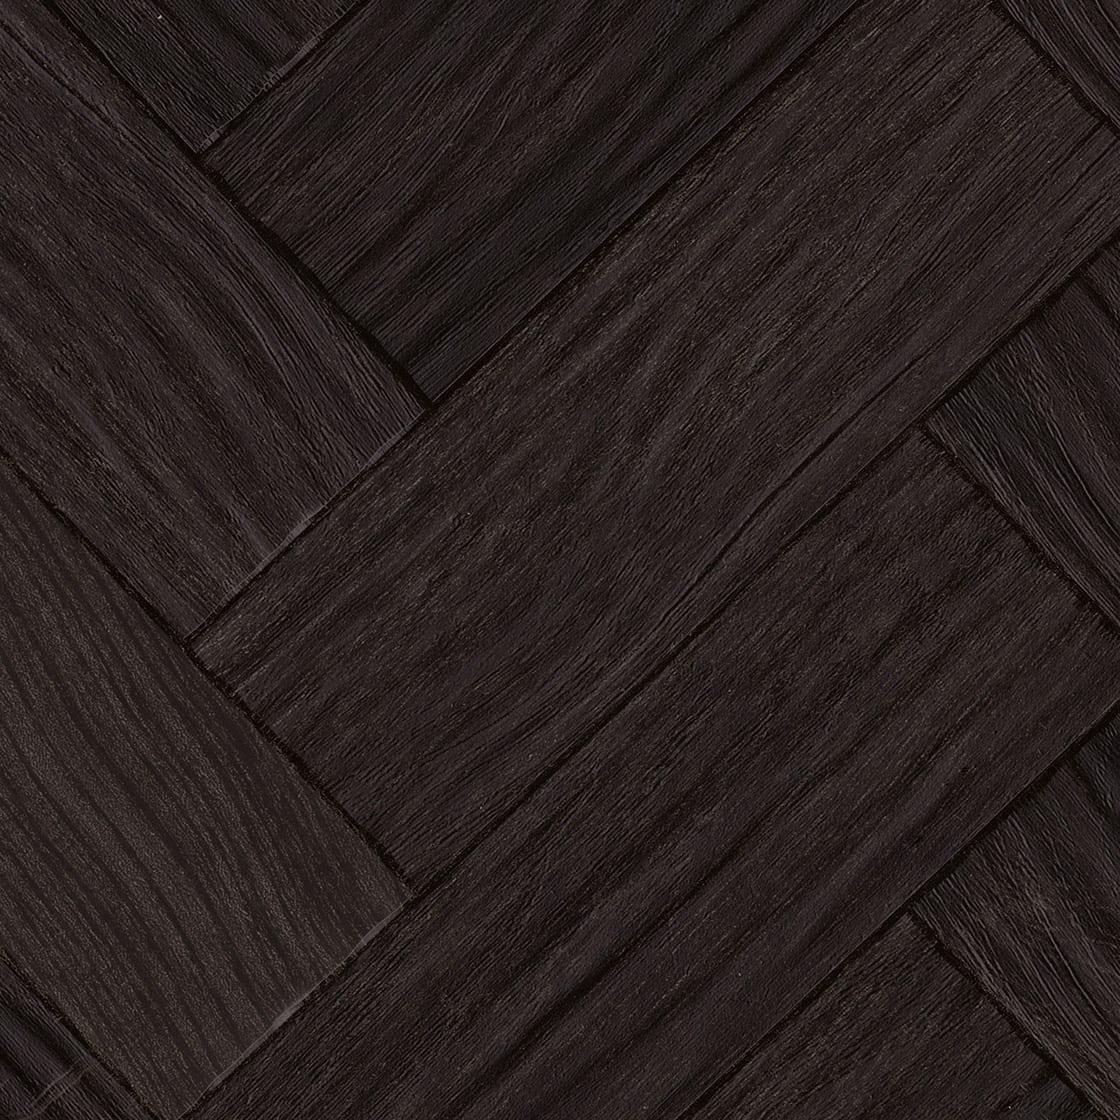 Karndean art select vinyl parquet flooring mckenzie willis for Art select parquet